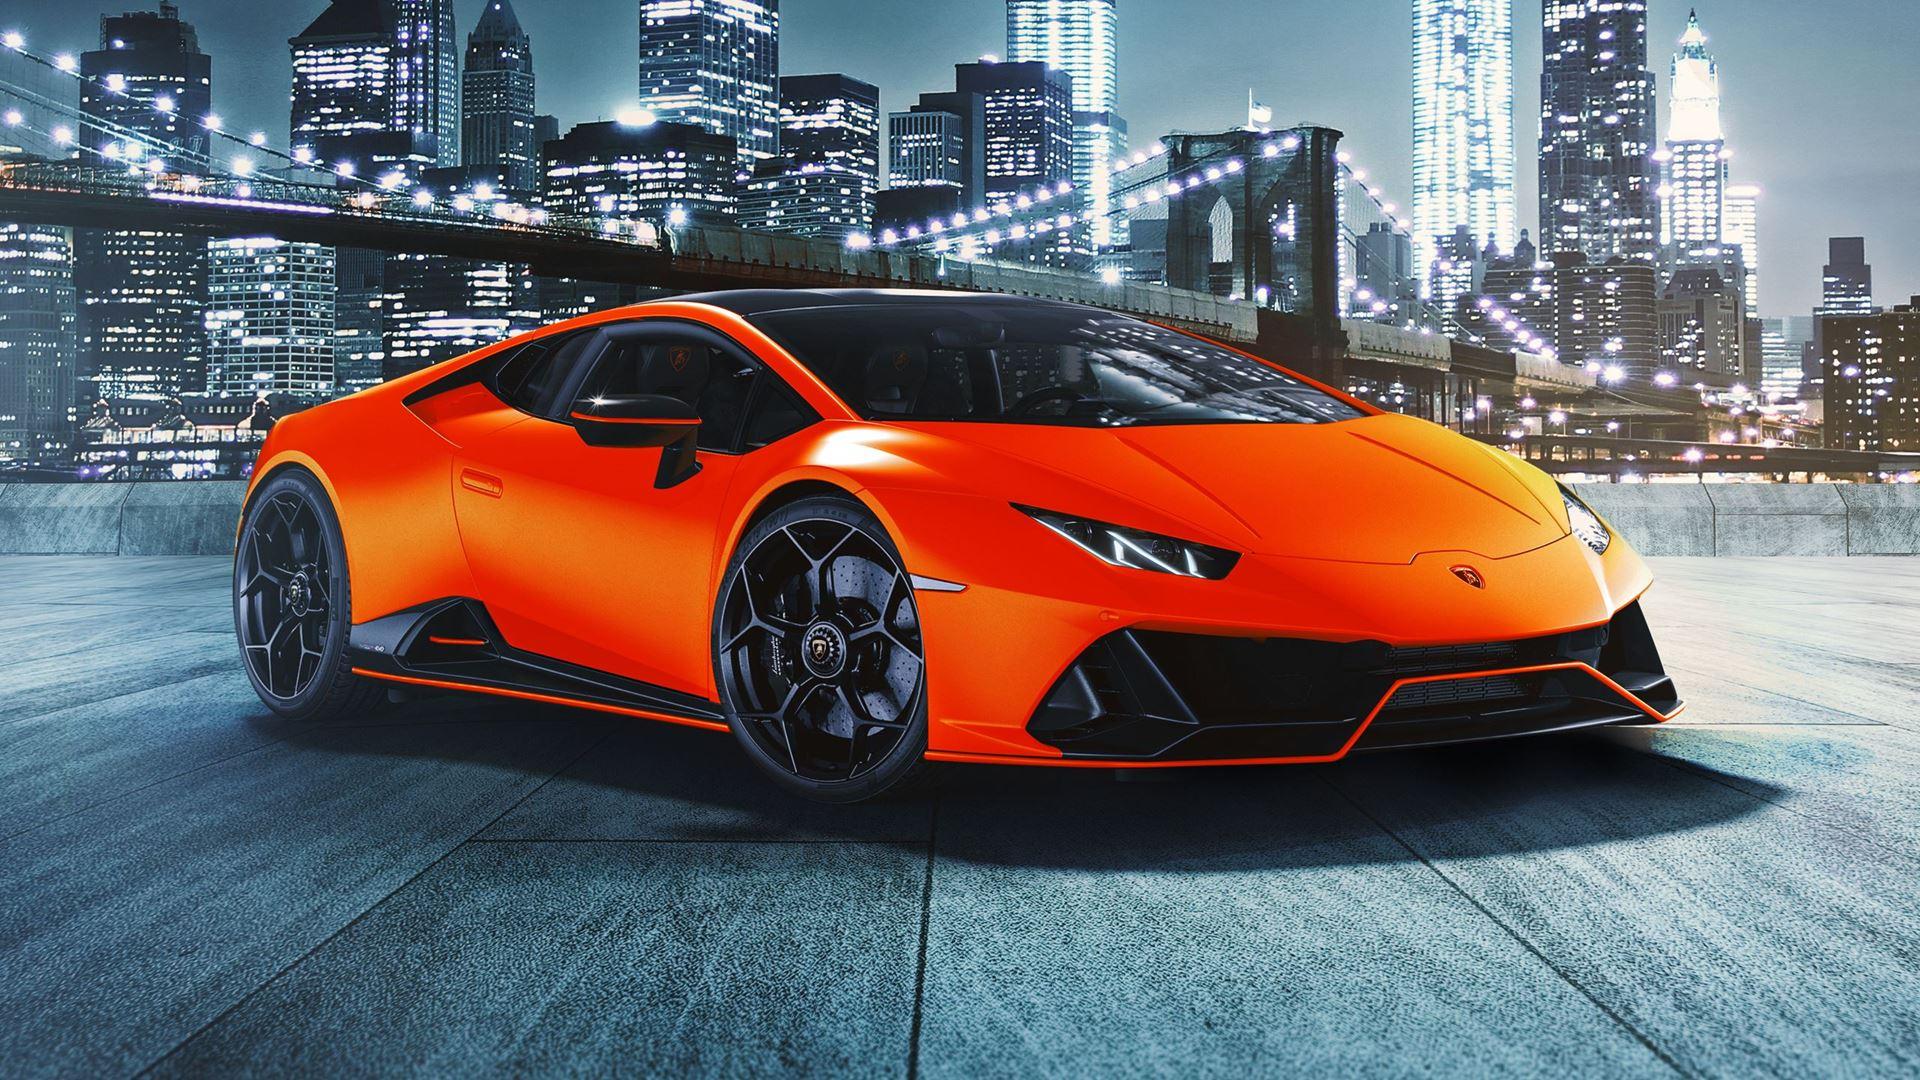 Daring elegance: Automobili Lamborghini presents the Huracán EVO Fluo Capsule - Image 3